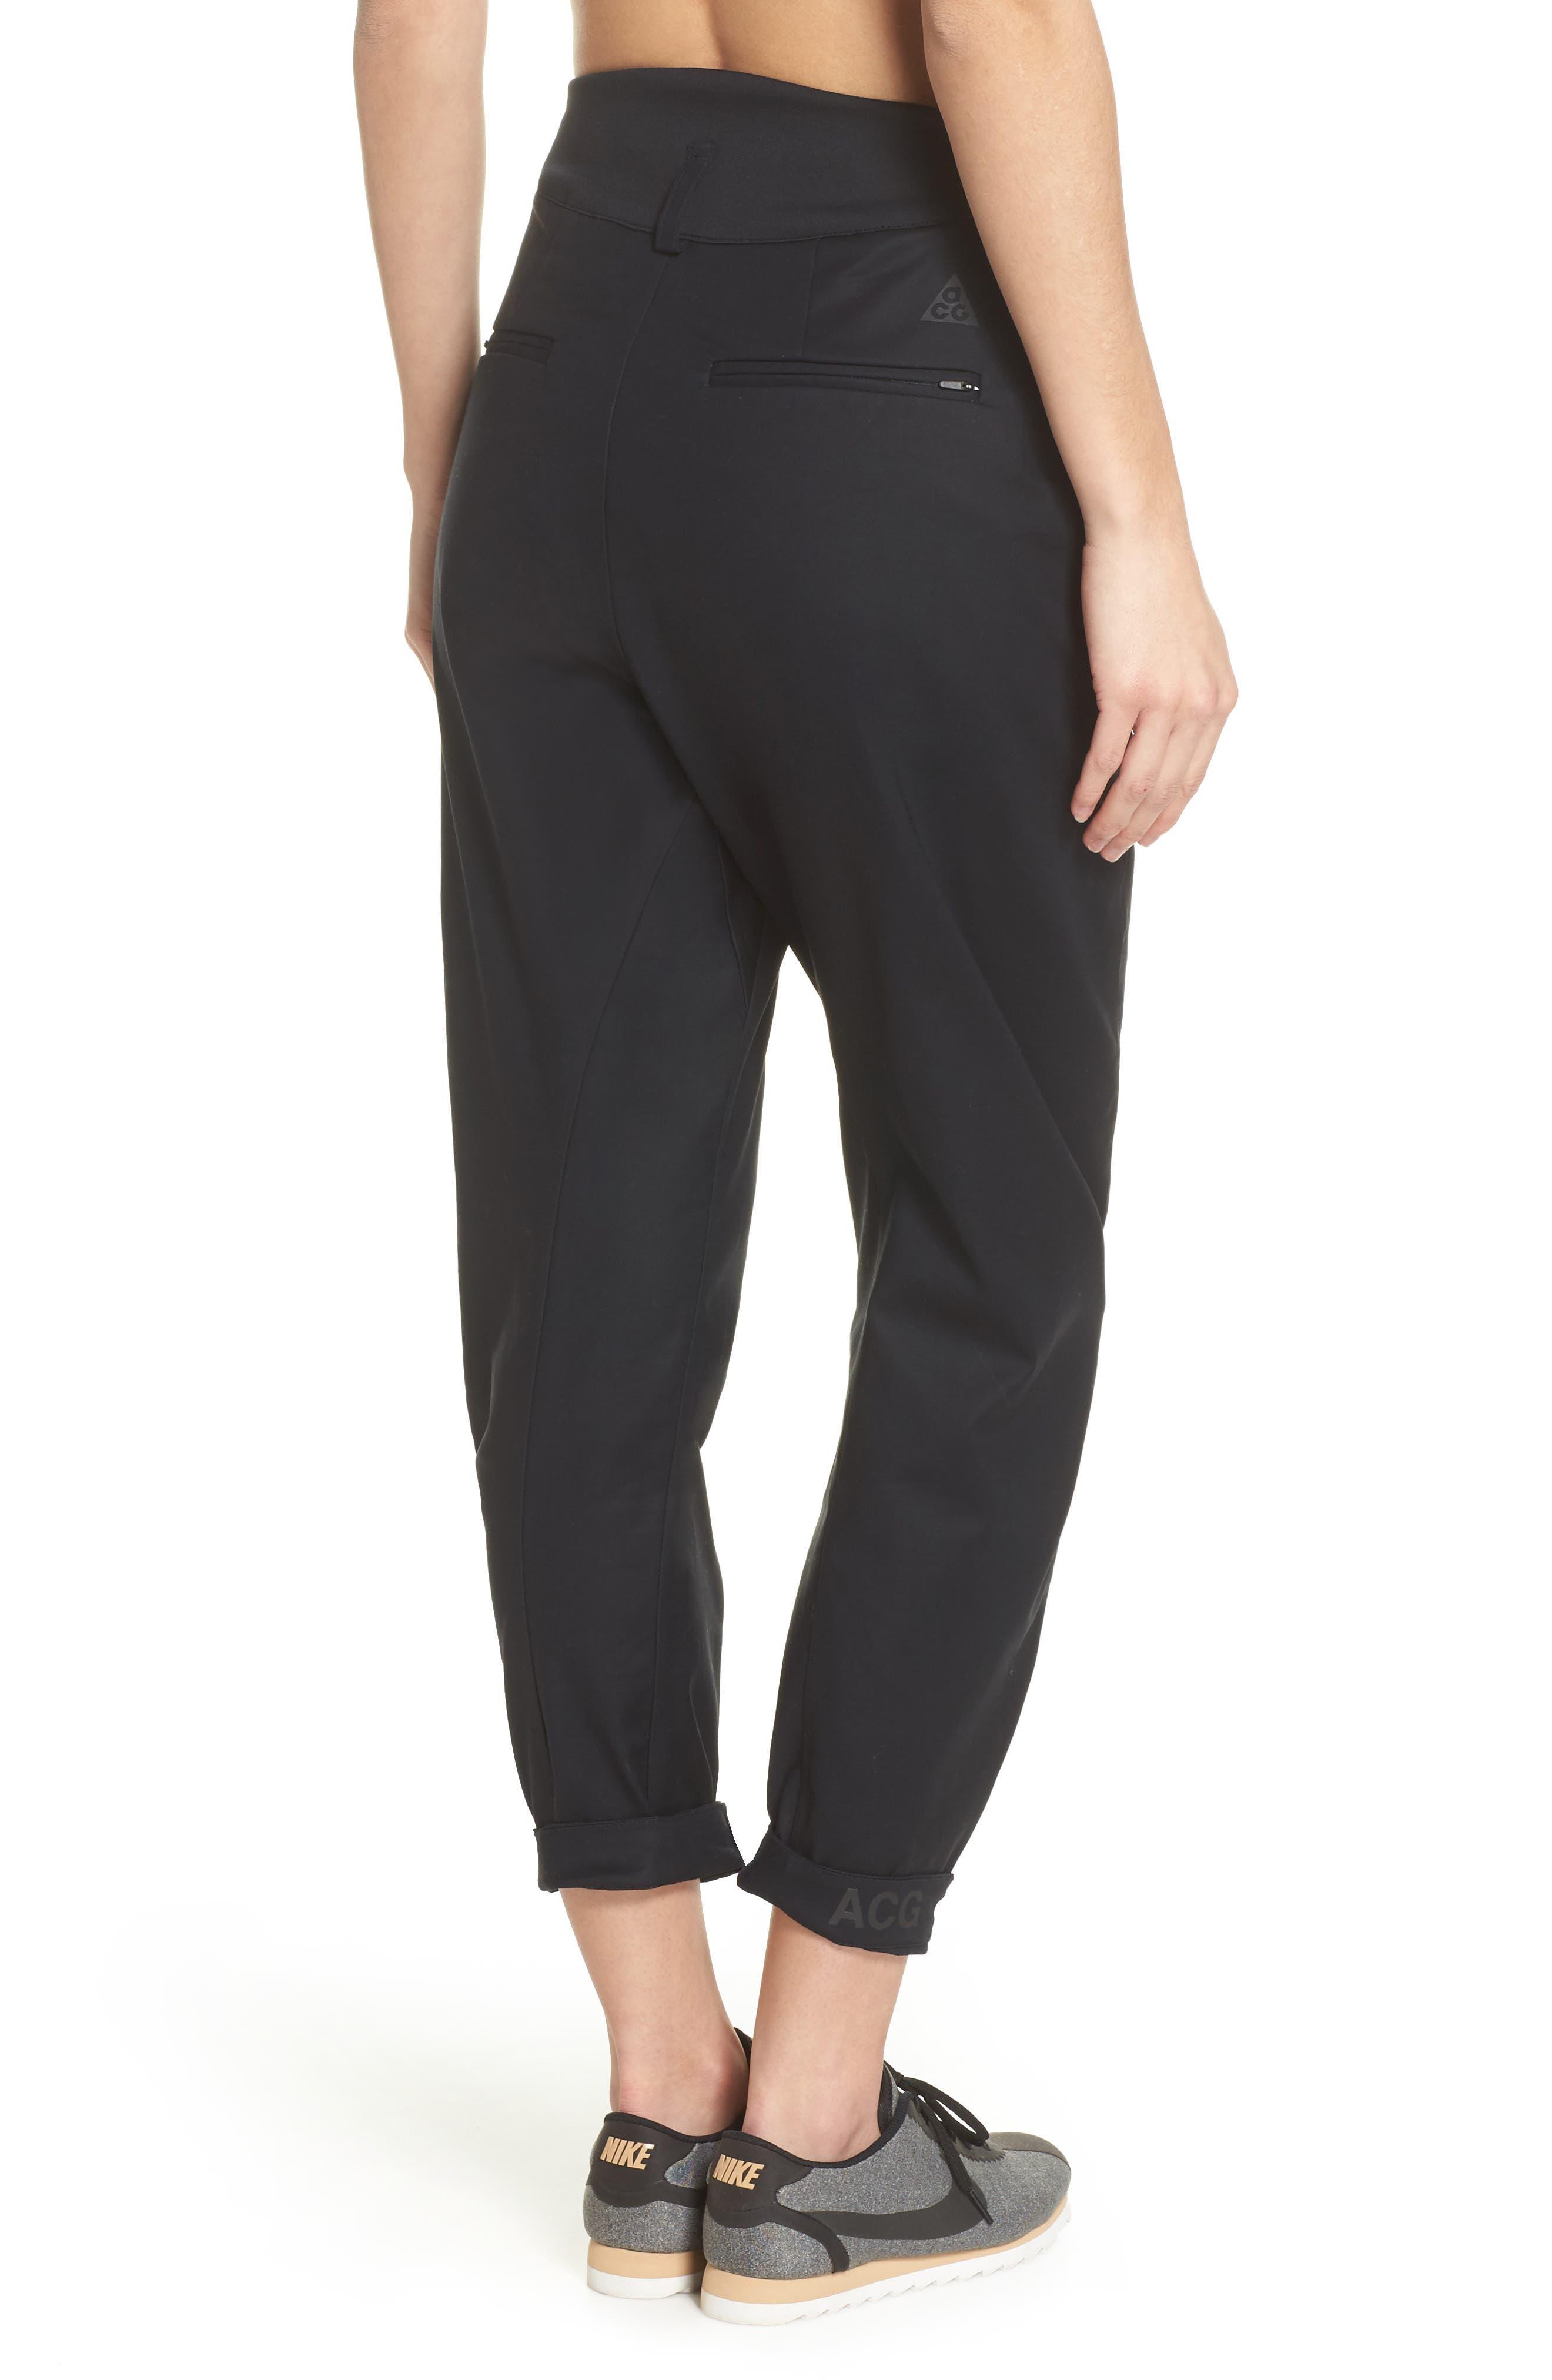 NikeLab ACG Tech Woven Pants,                             Alternate thumbnail 2, color,                             Black